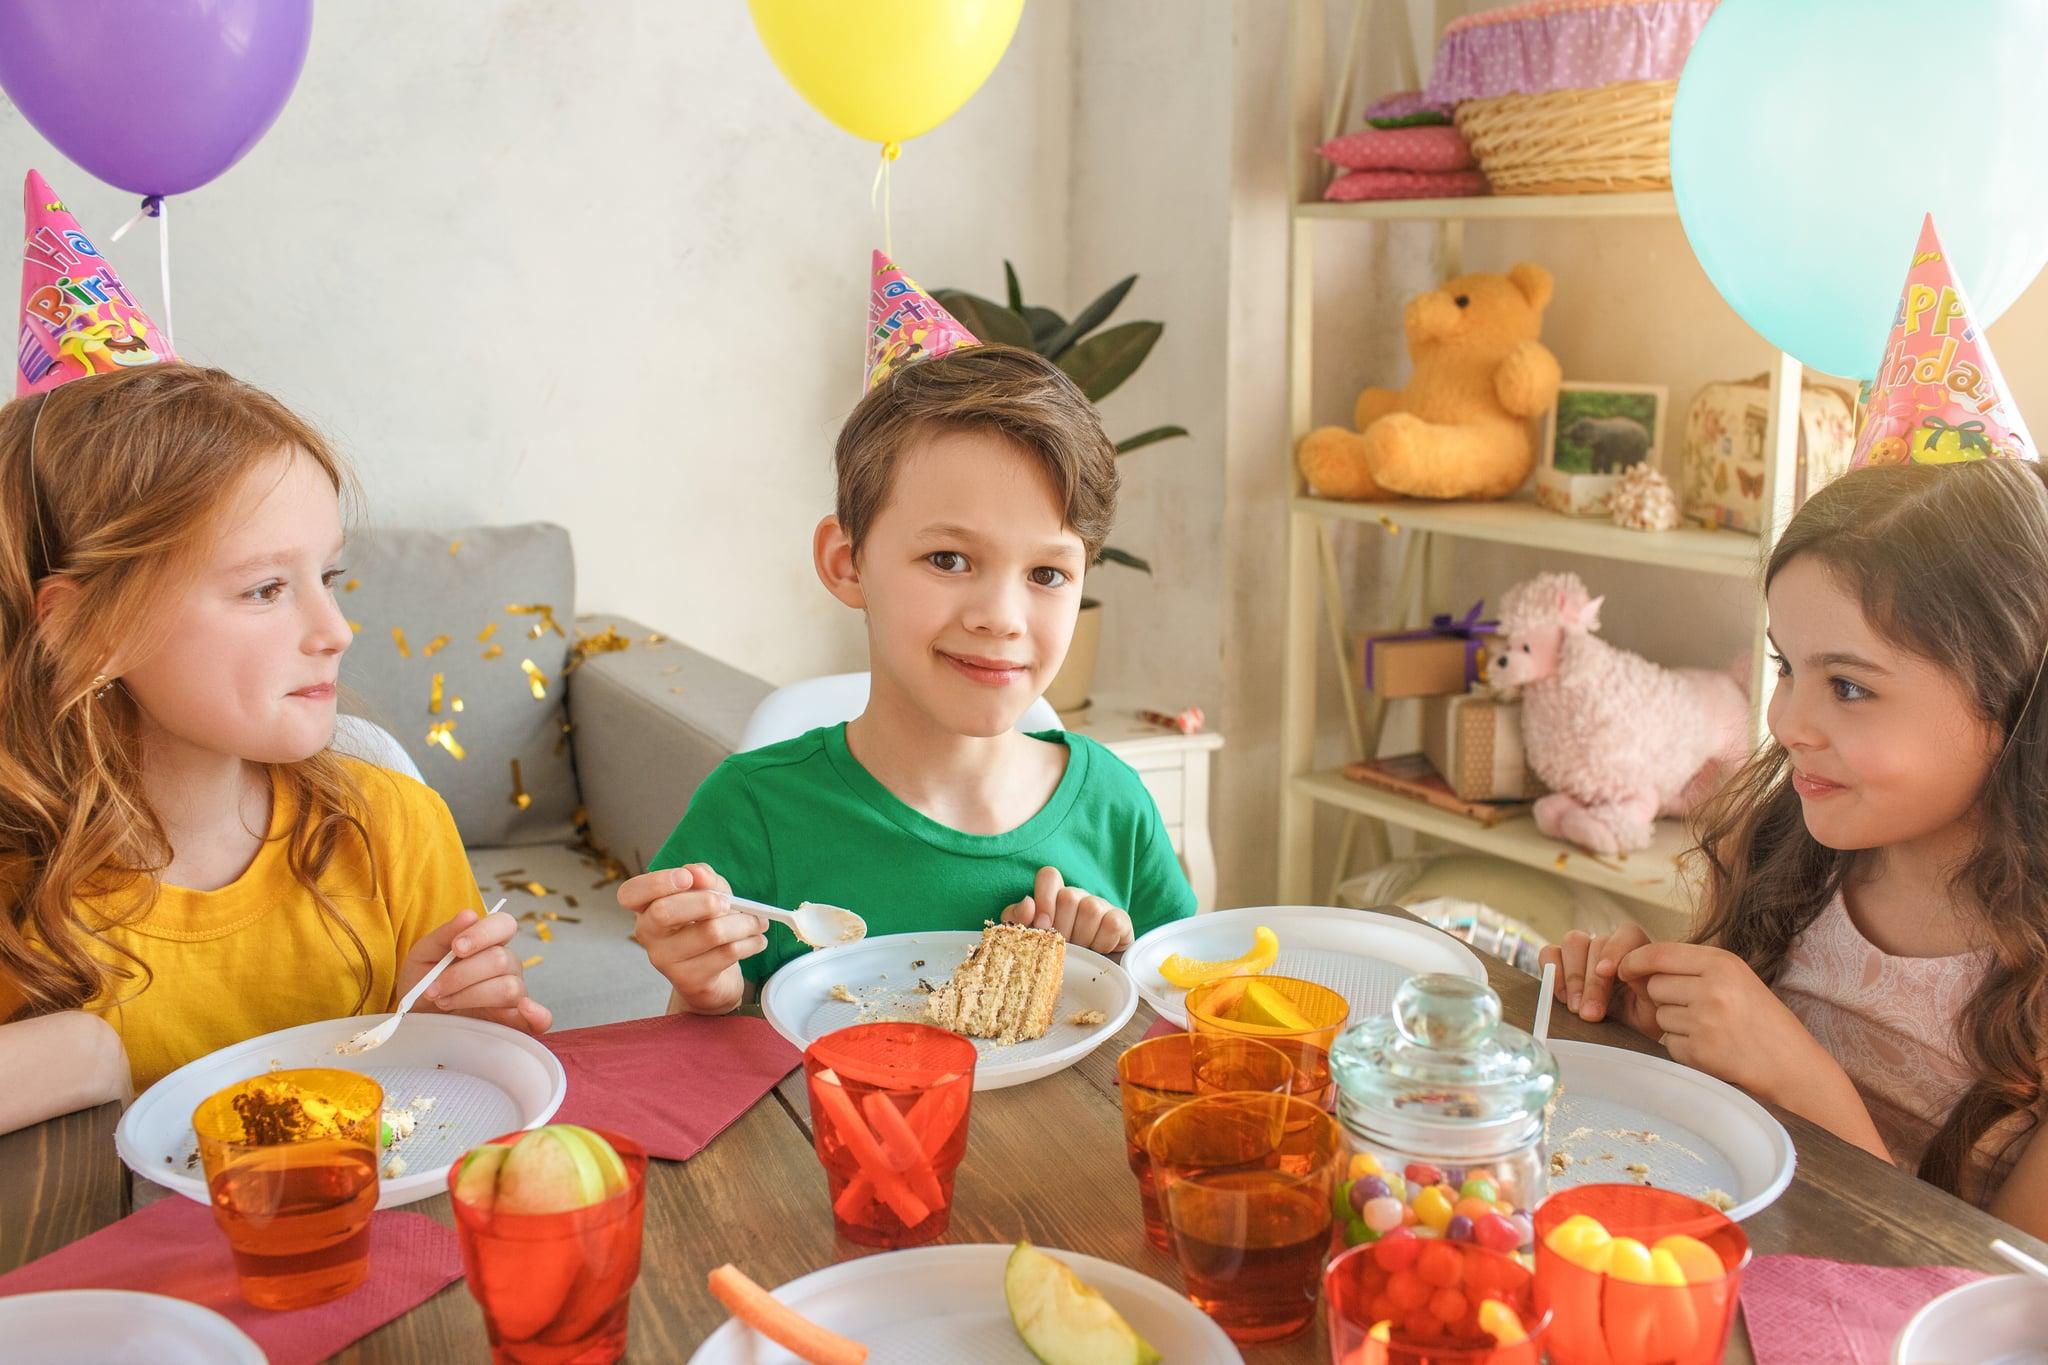 No gifts at kids birthday parties popsugar australia parenting share this link stopboris Choice Image